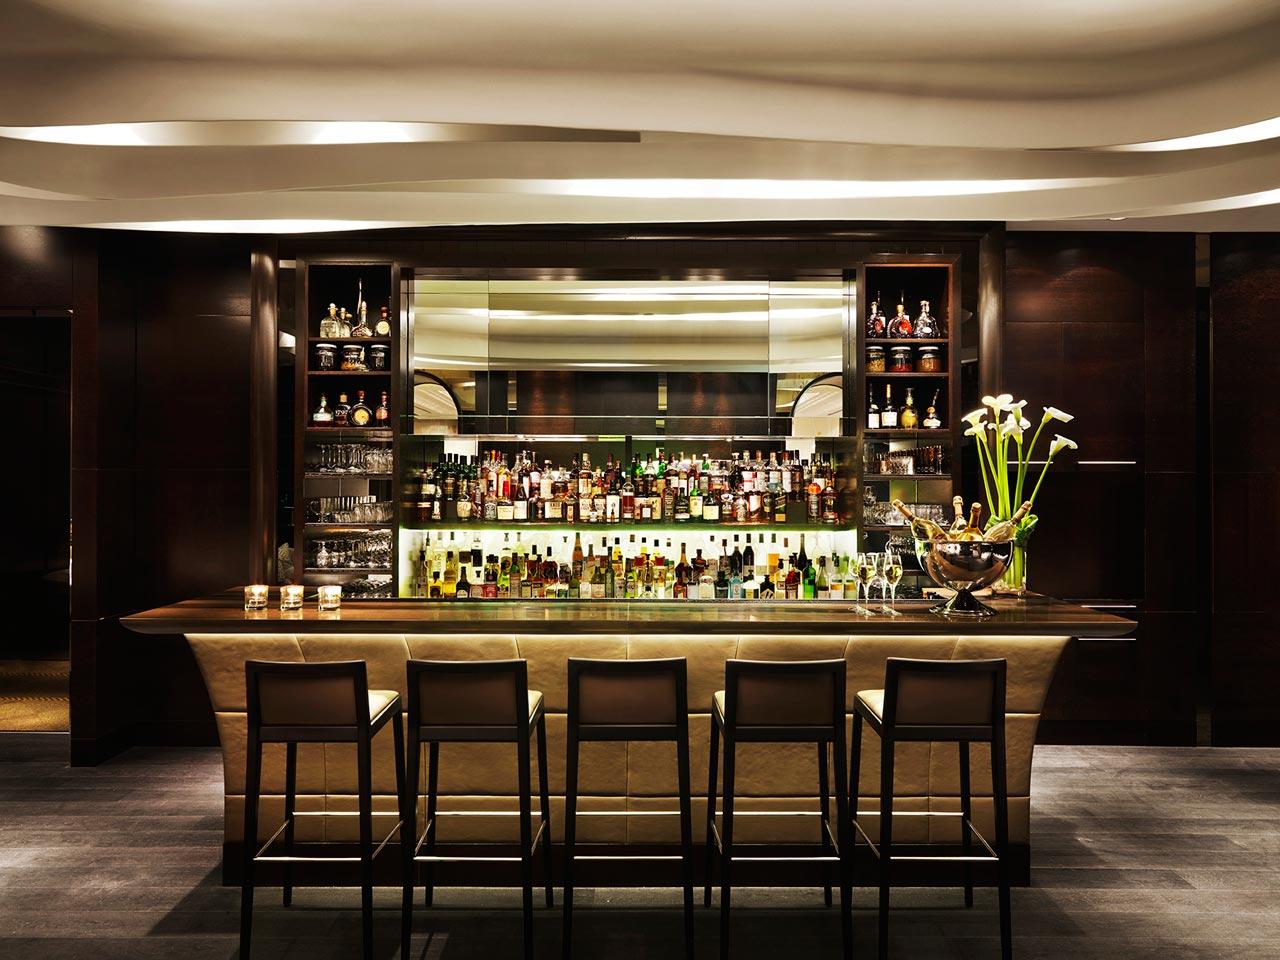 The bar at Hawksworth